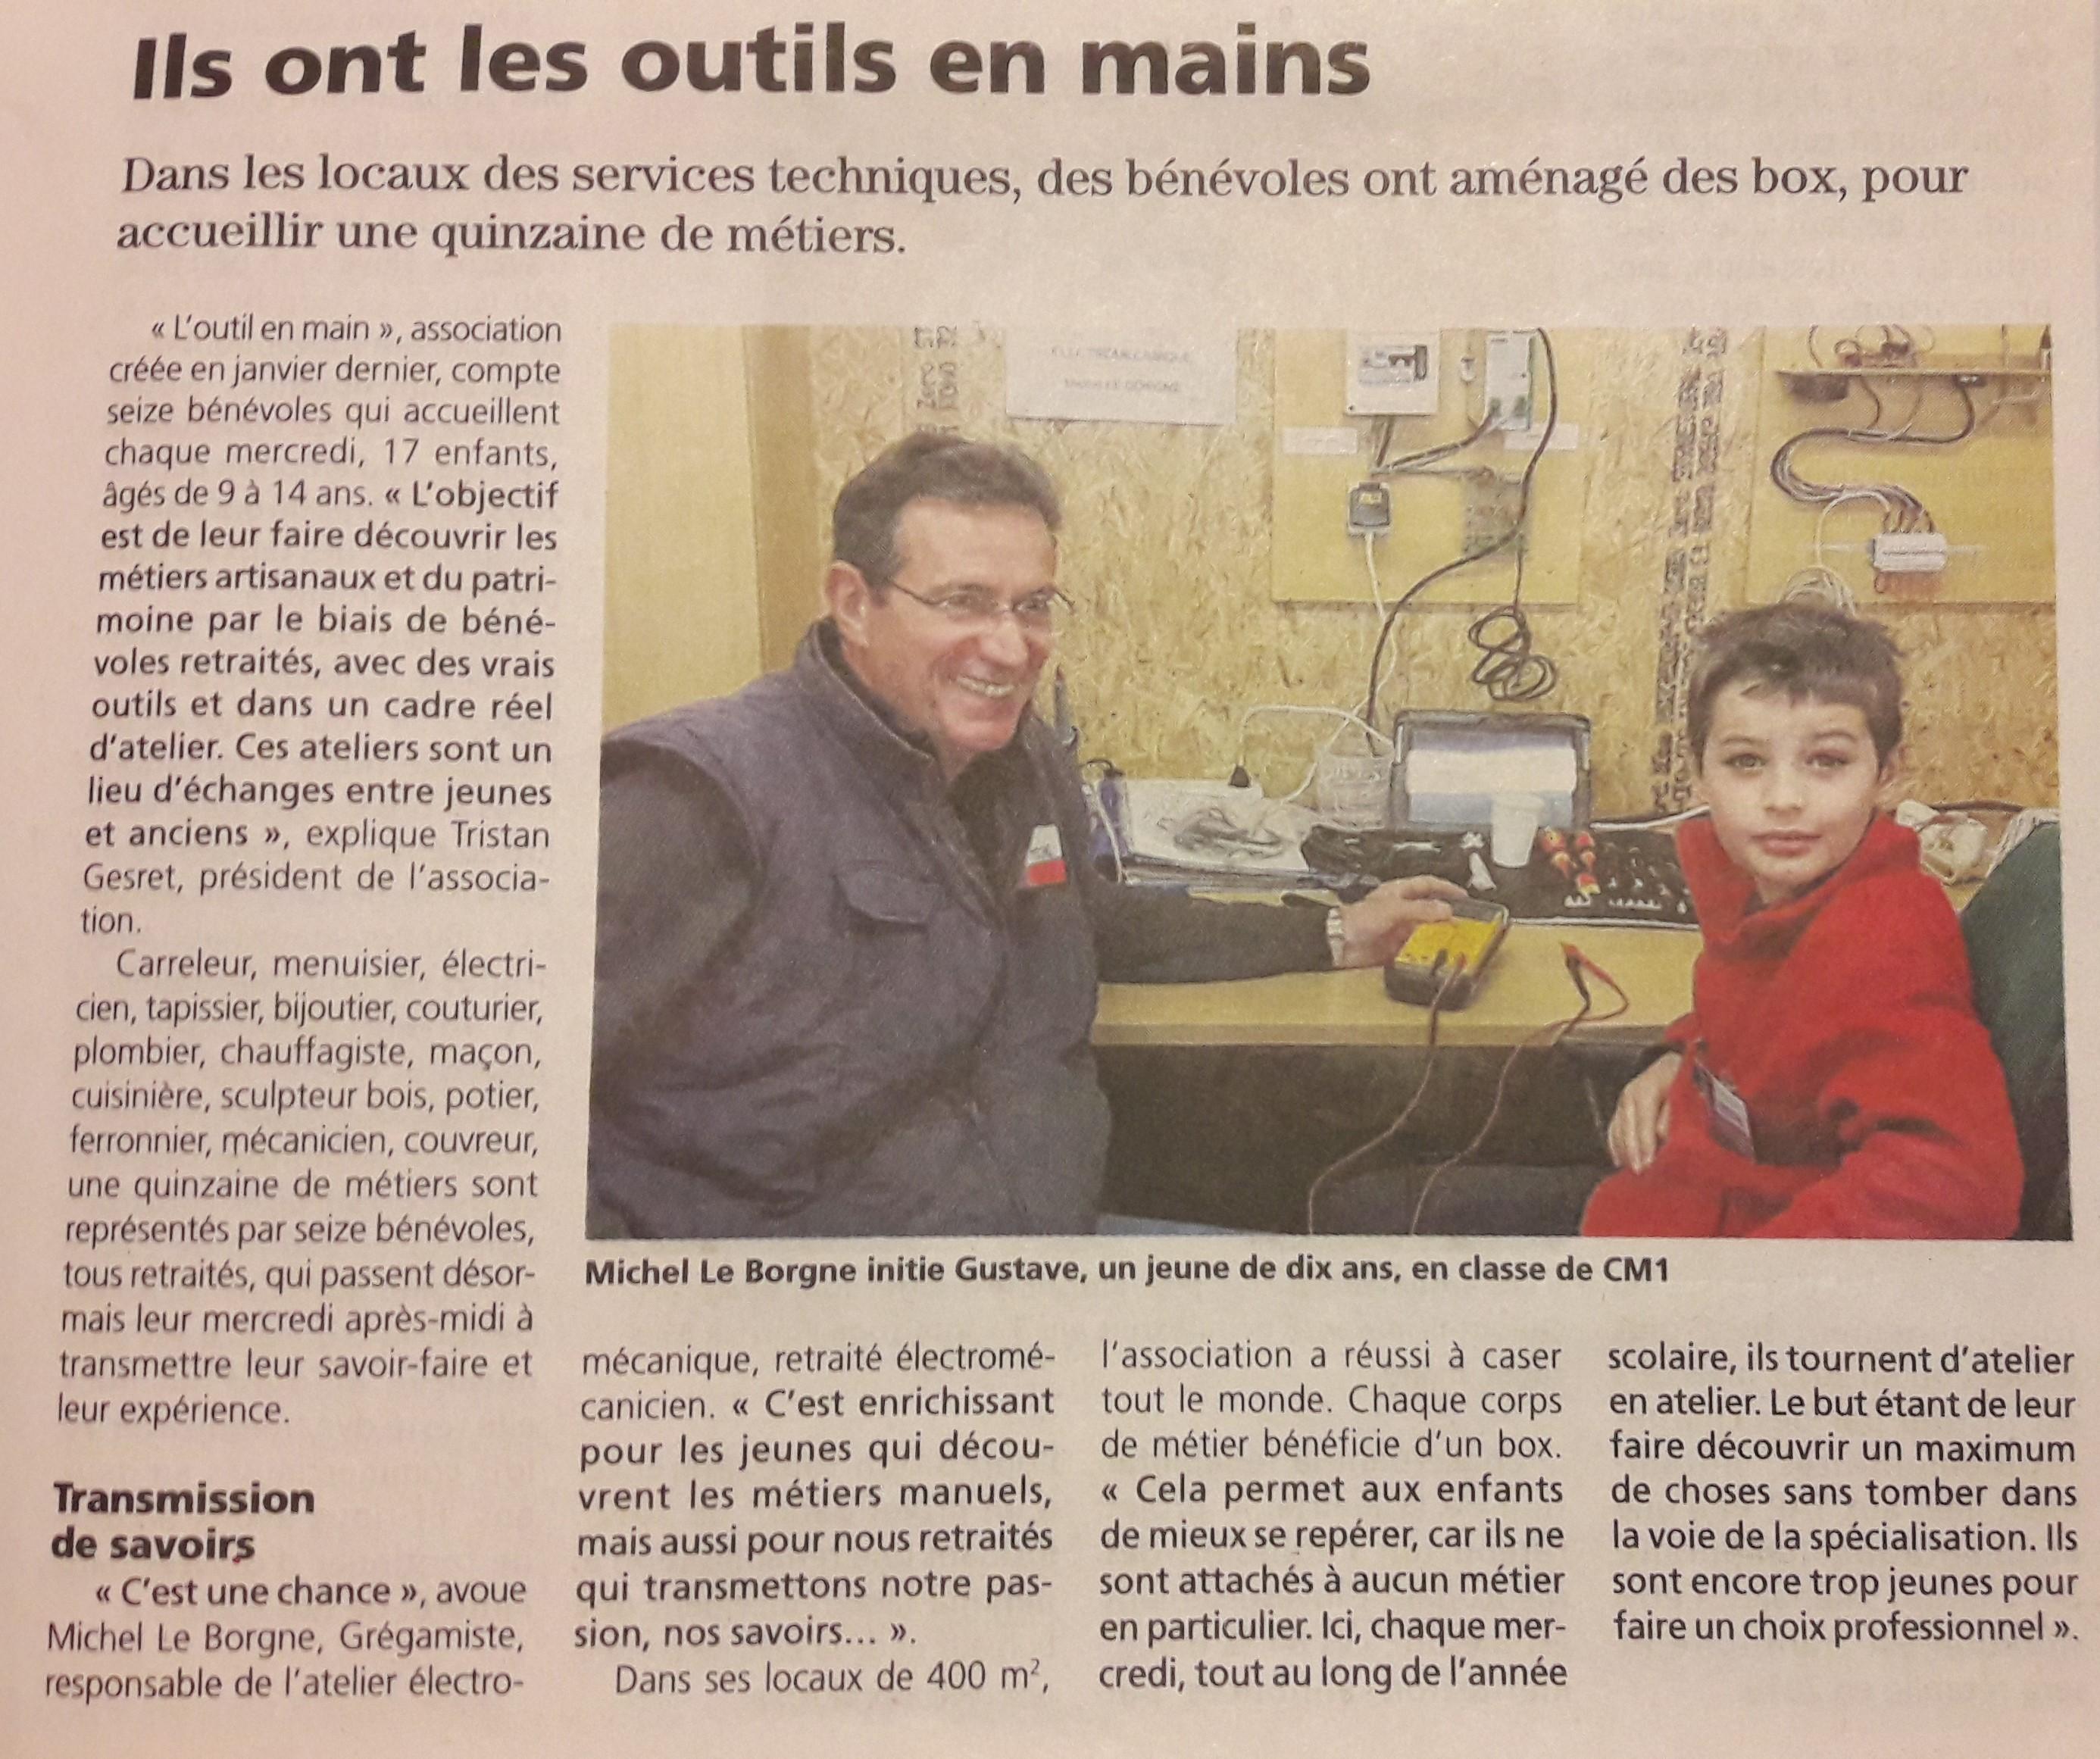 debut-ateliers-outil-en-main-du-loch-grand-champ